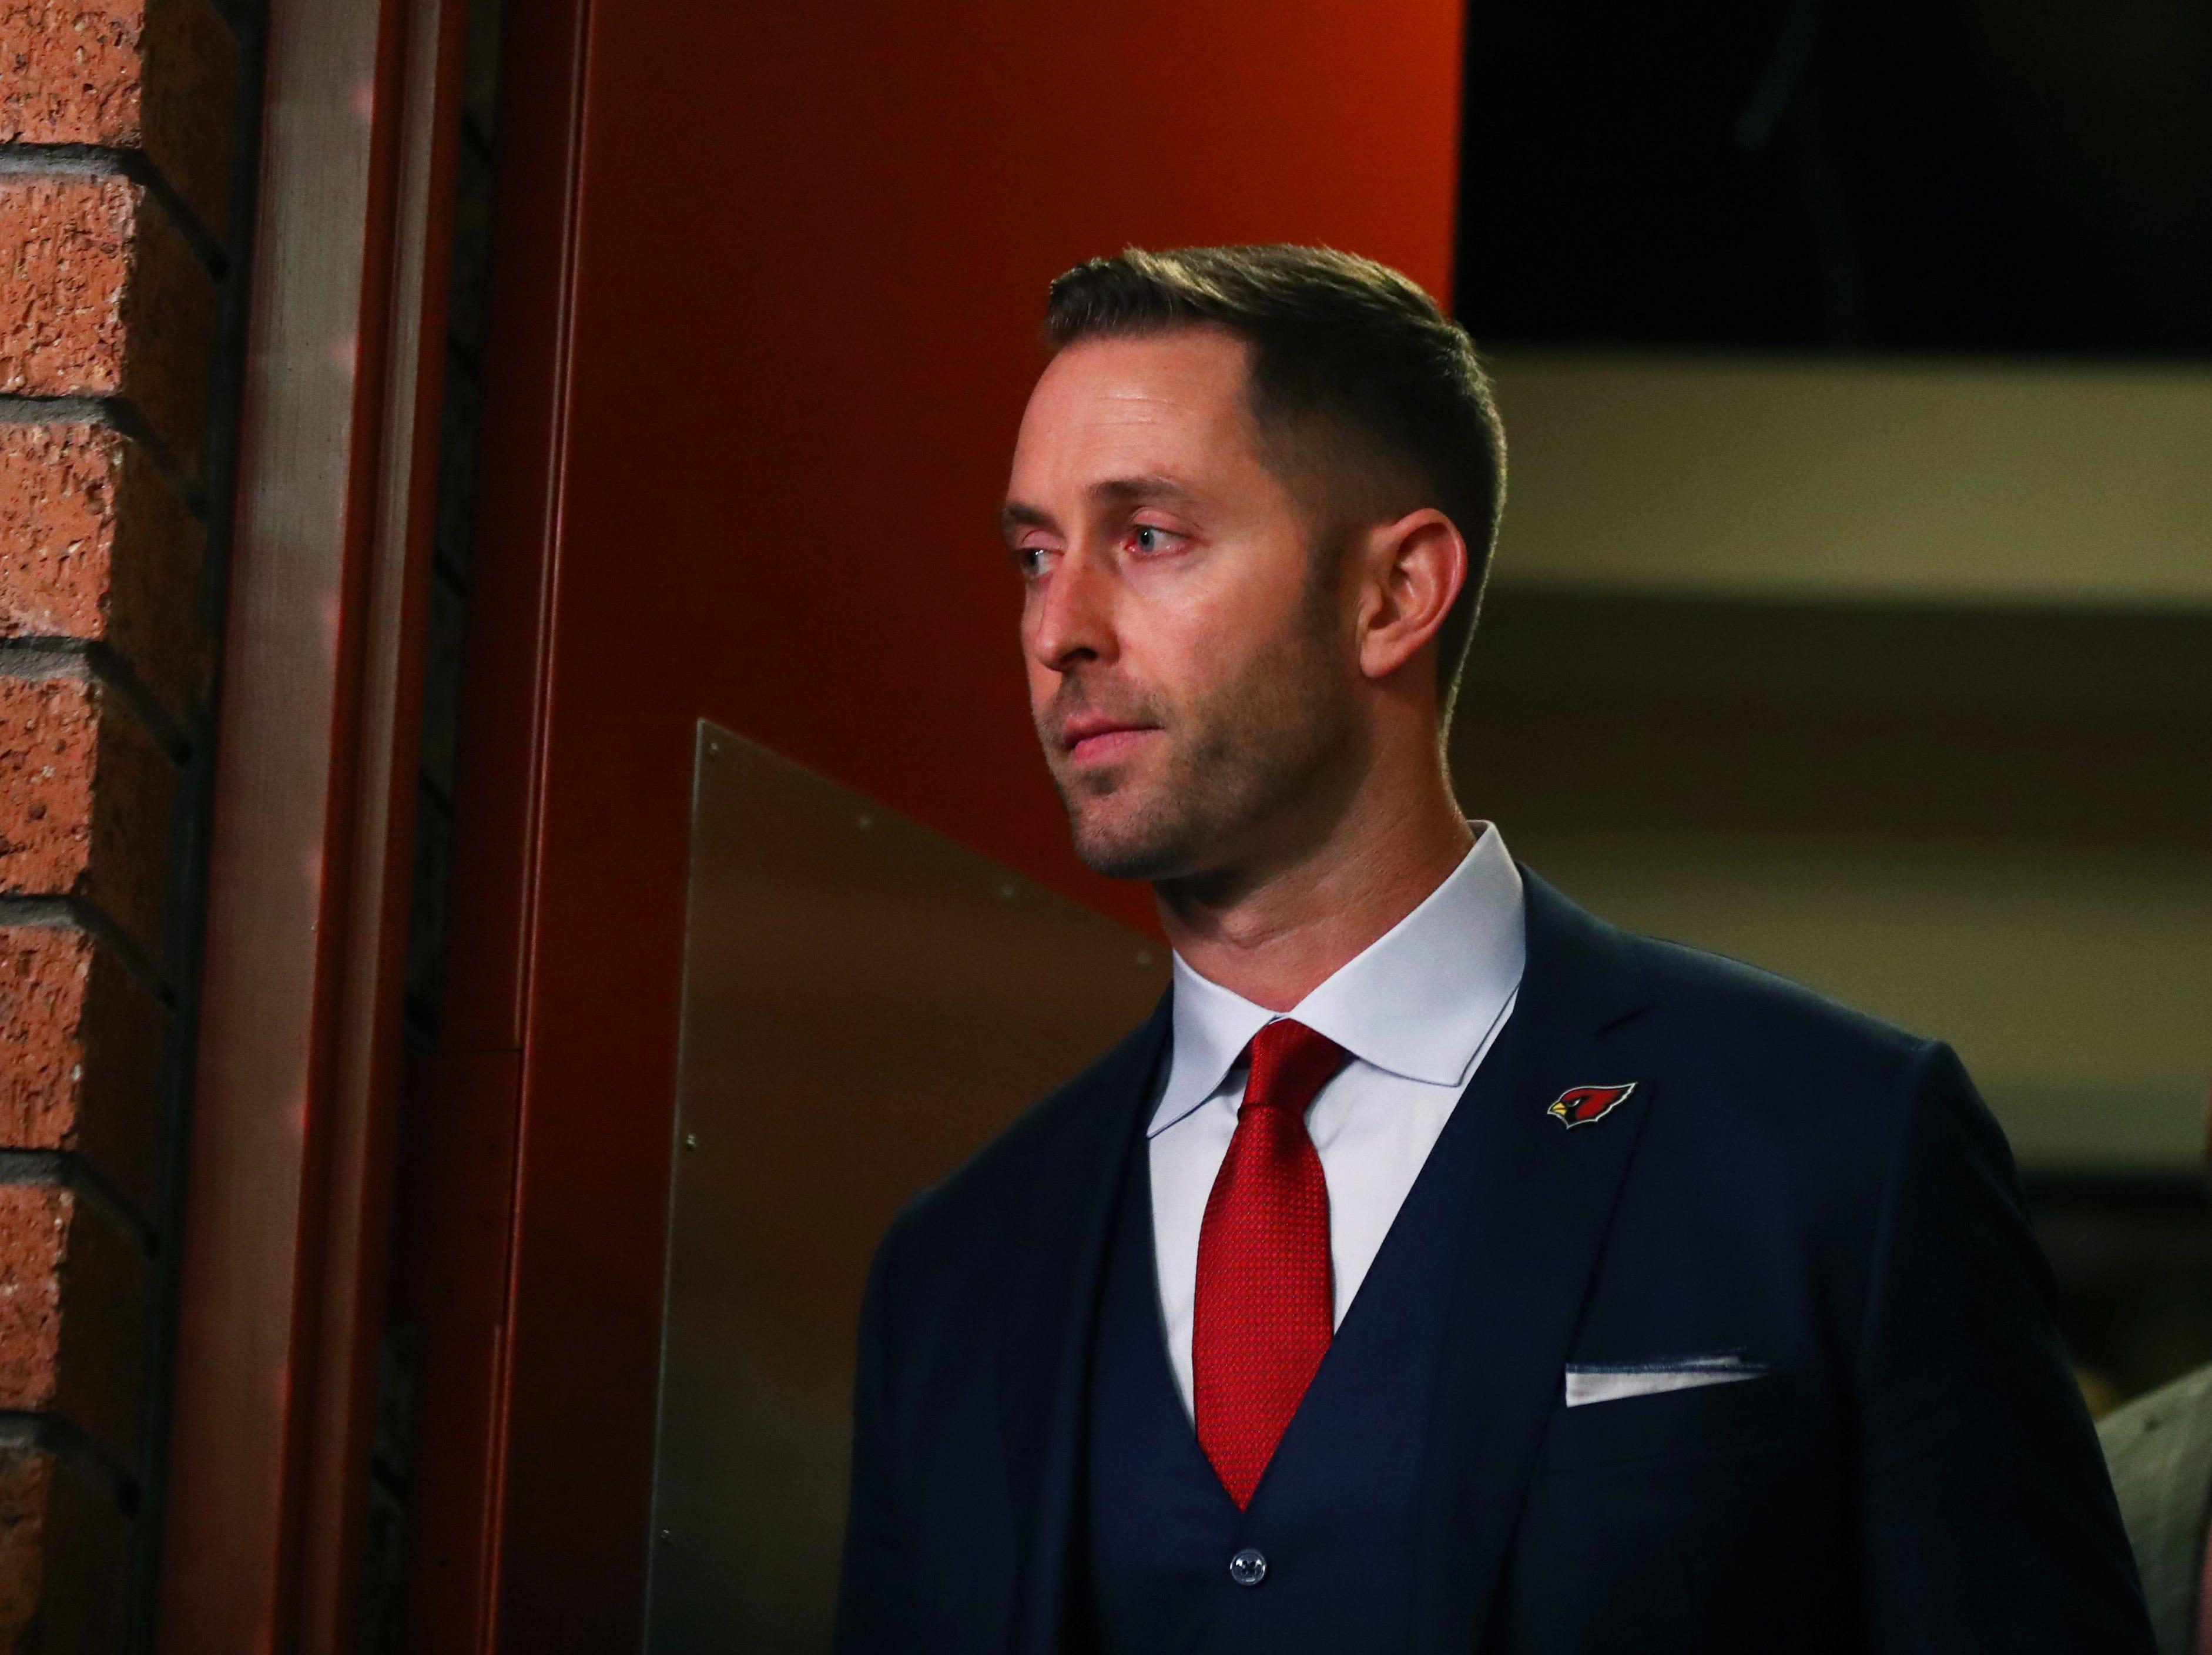 Arizona Cardinals' Kliff Kingsbury addresses comments about drafting Kyler Murray